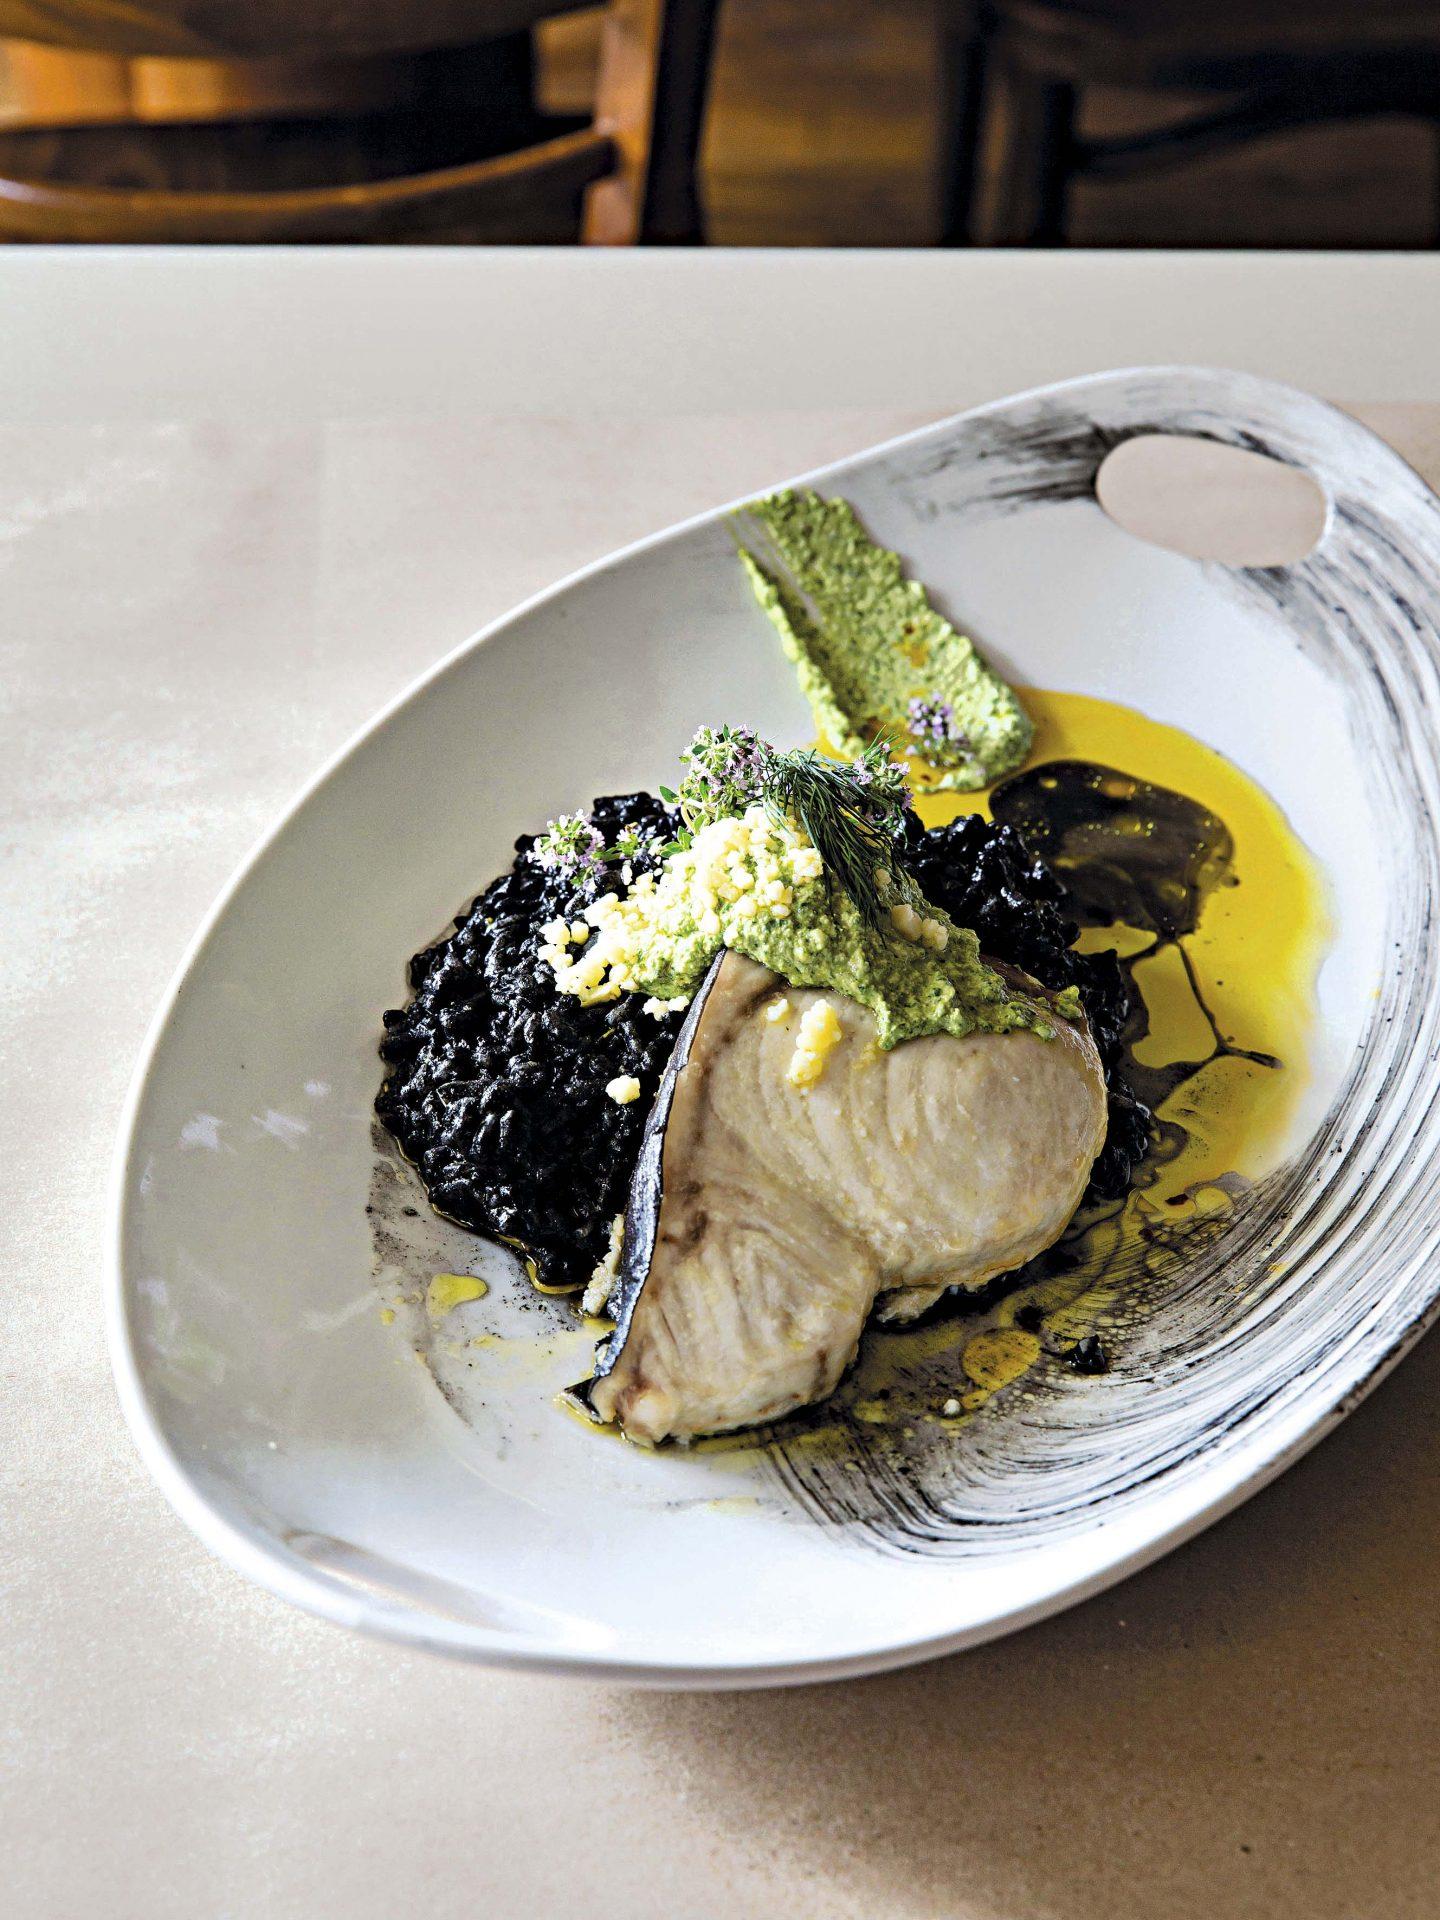 Pez vela pochado con aceite de oliva